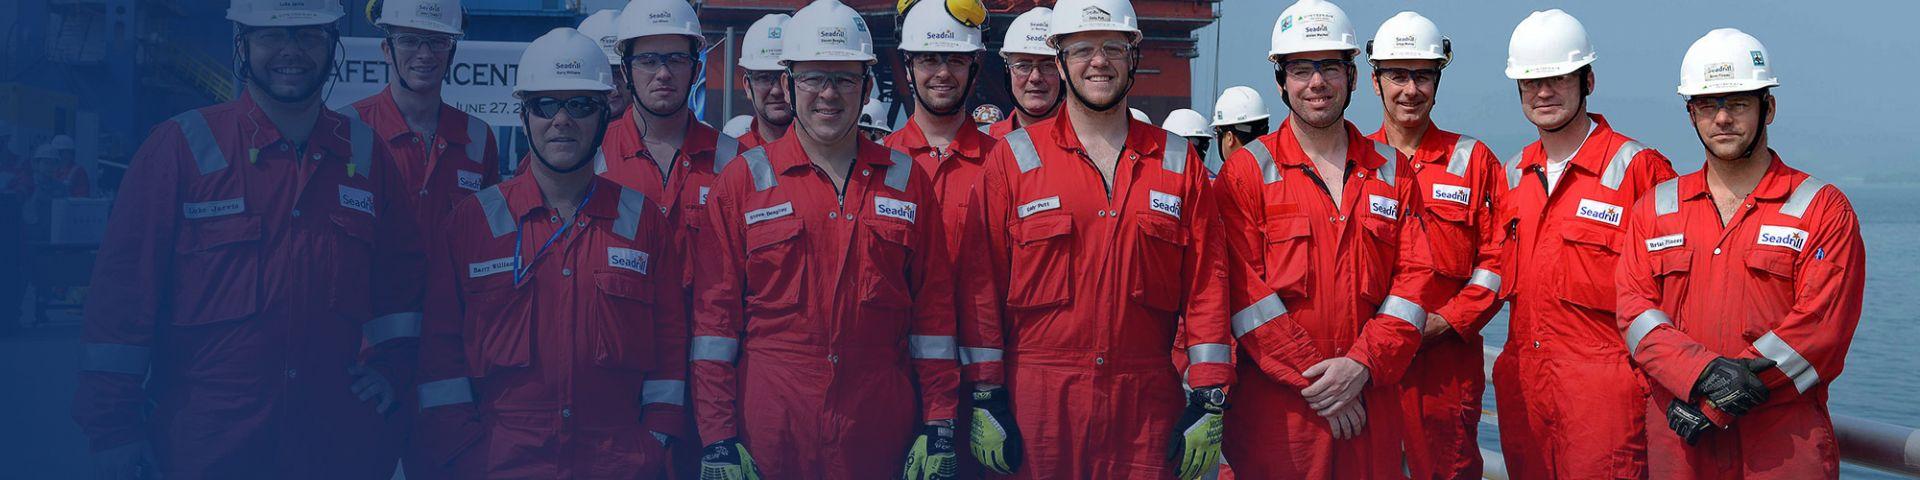 meet-our-offshore-team.jpg